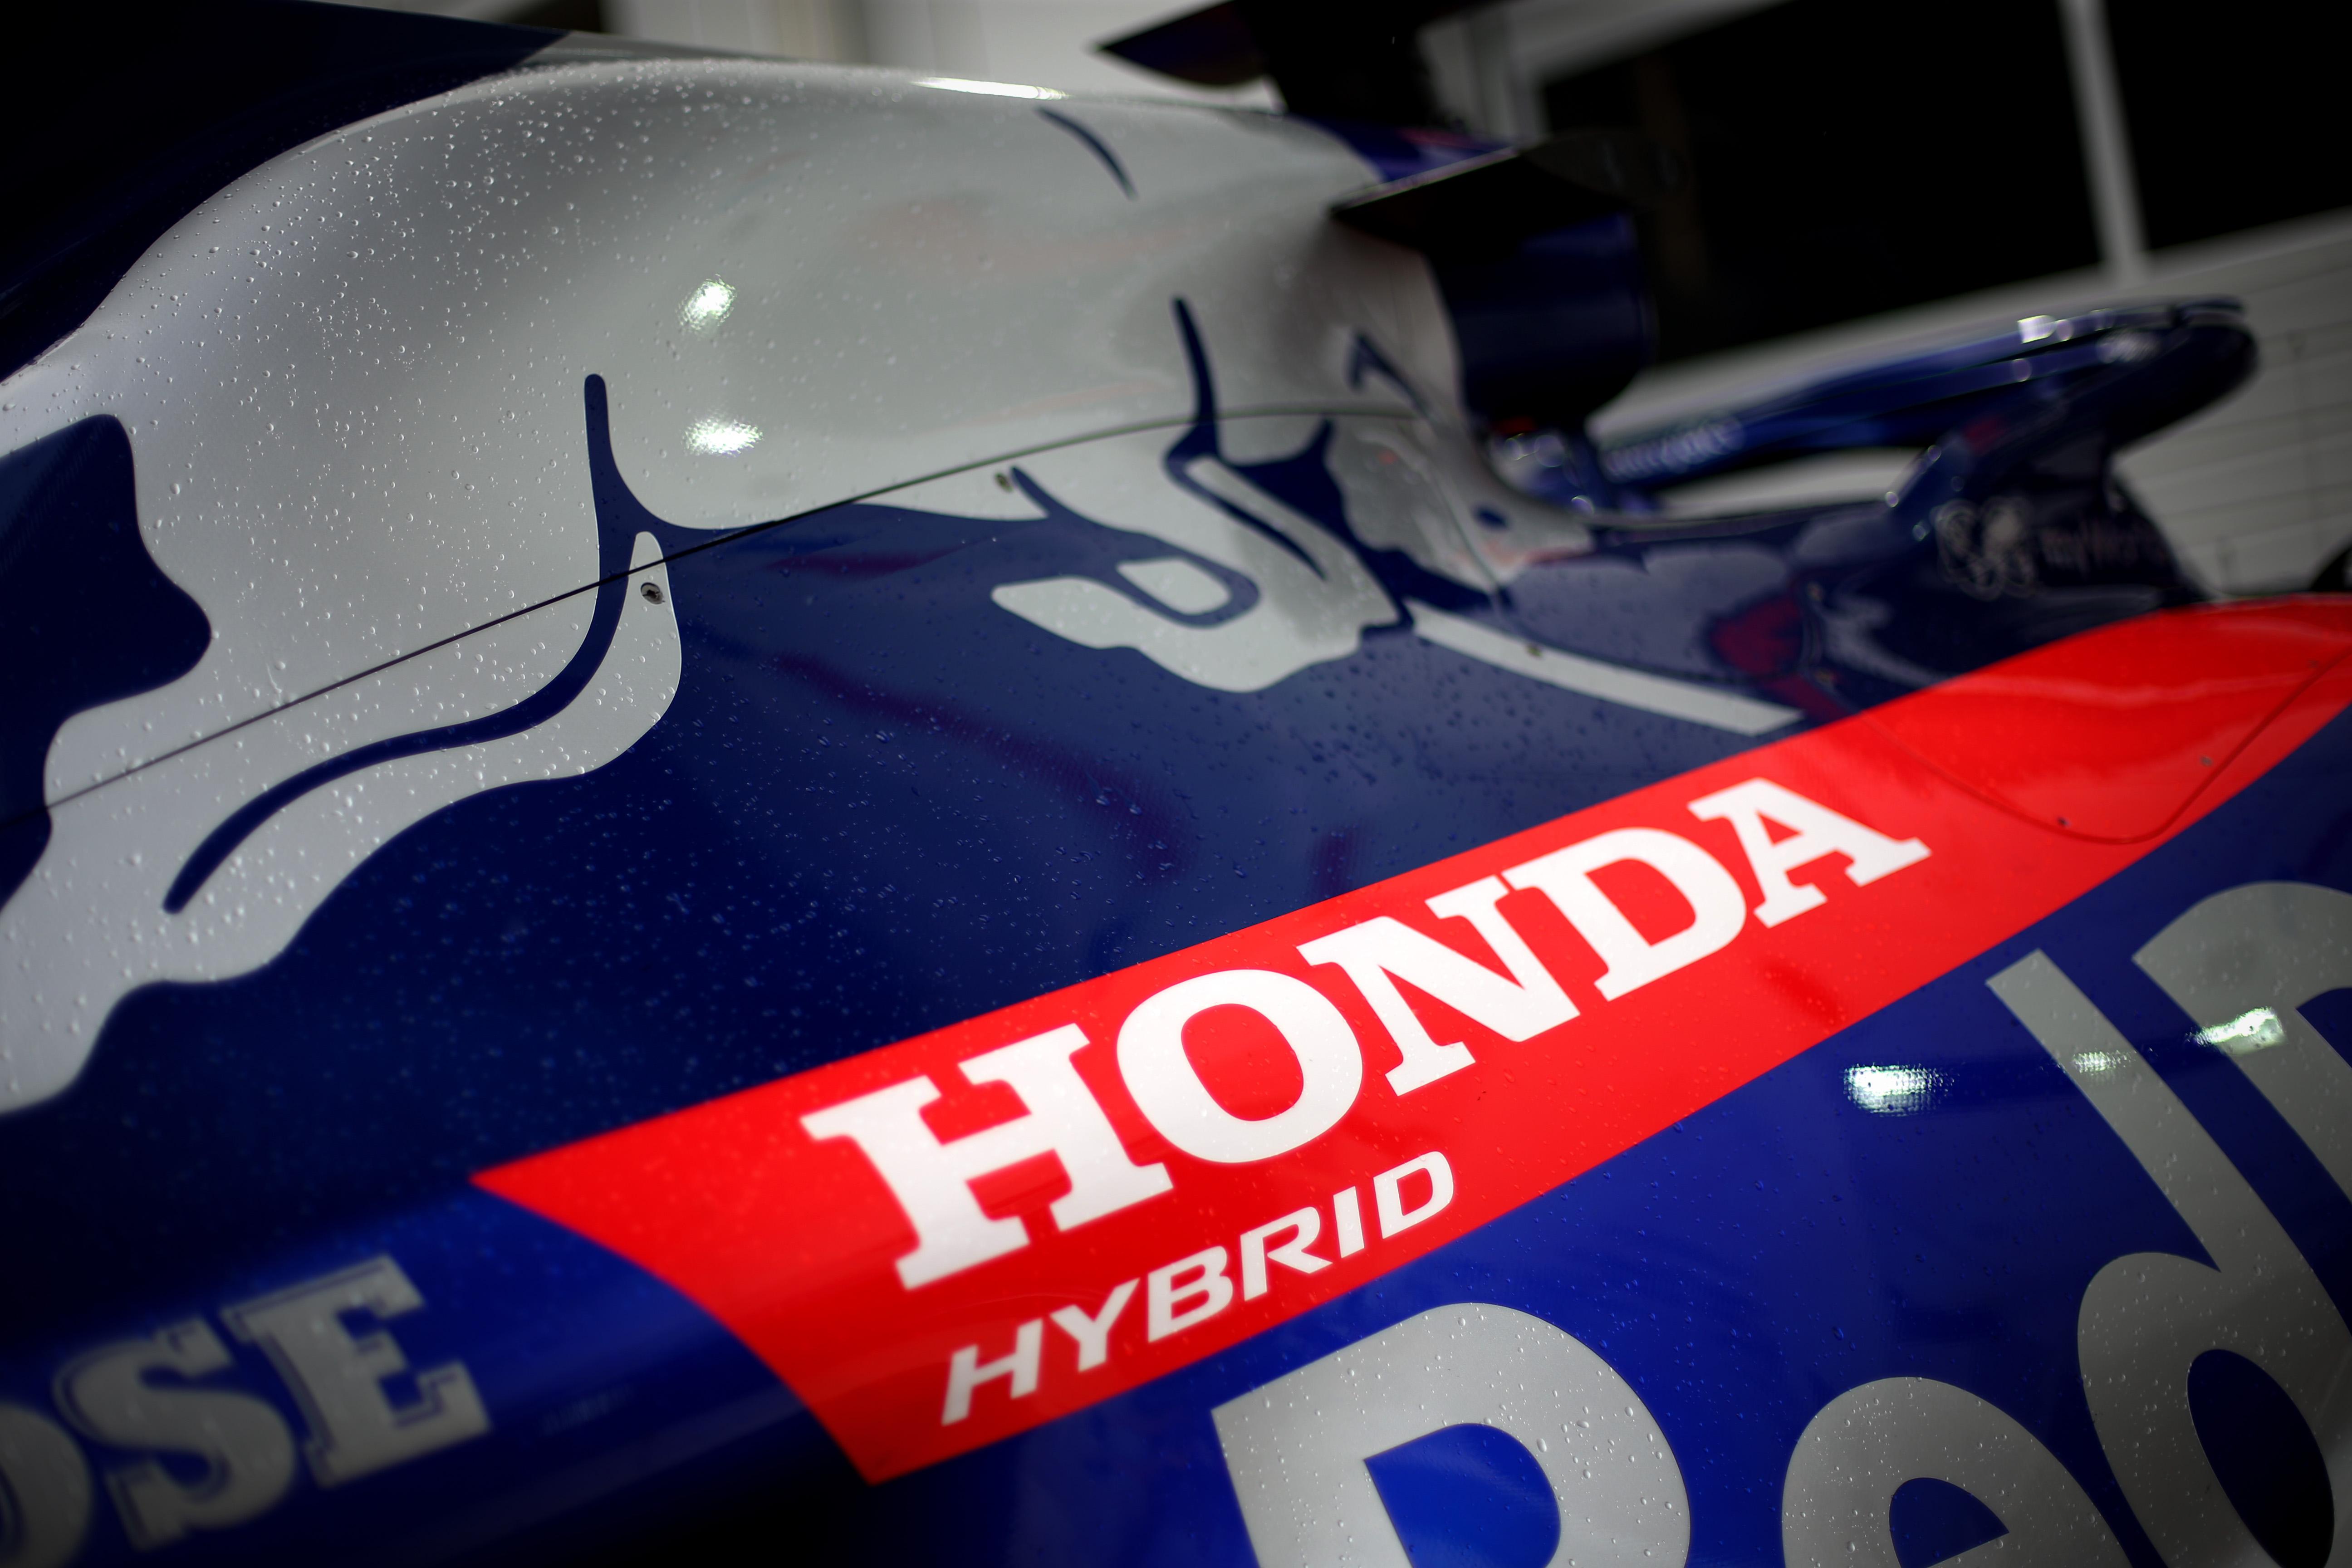 Motor Racing Formula One World Championship Russian Grand Prix Preparation Day Sochi, Russia